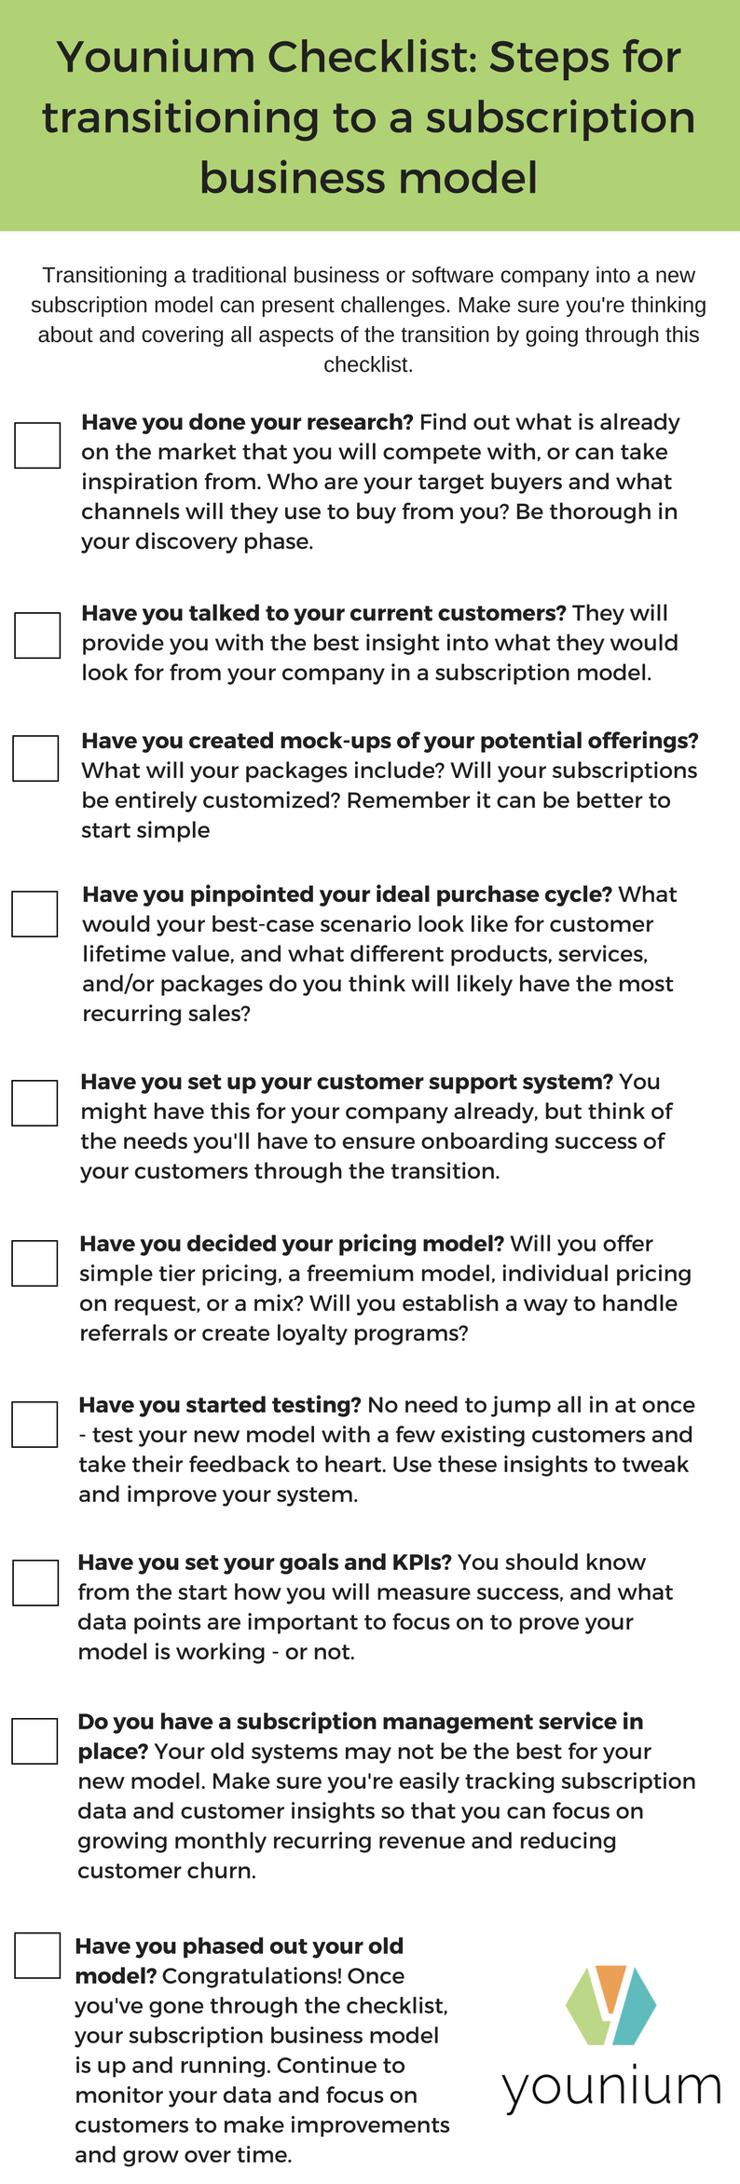 Younium Subscription Model Checklist.png